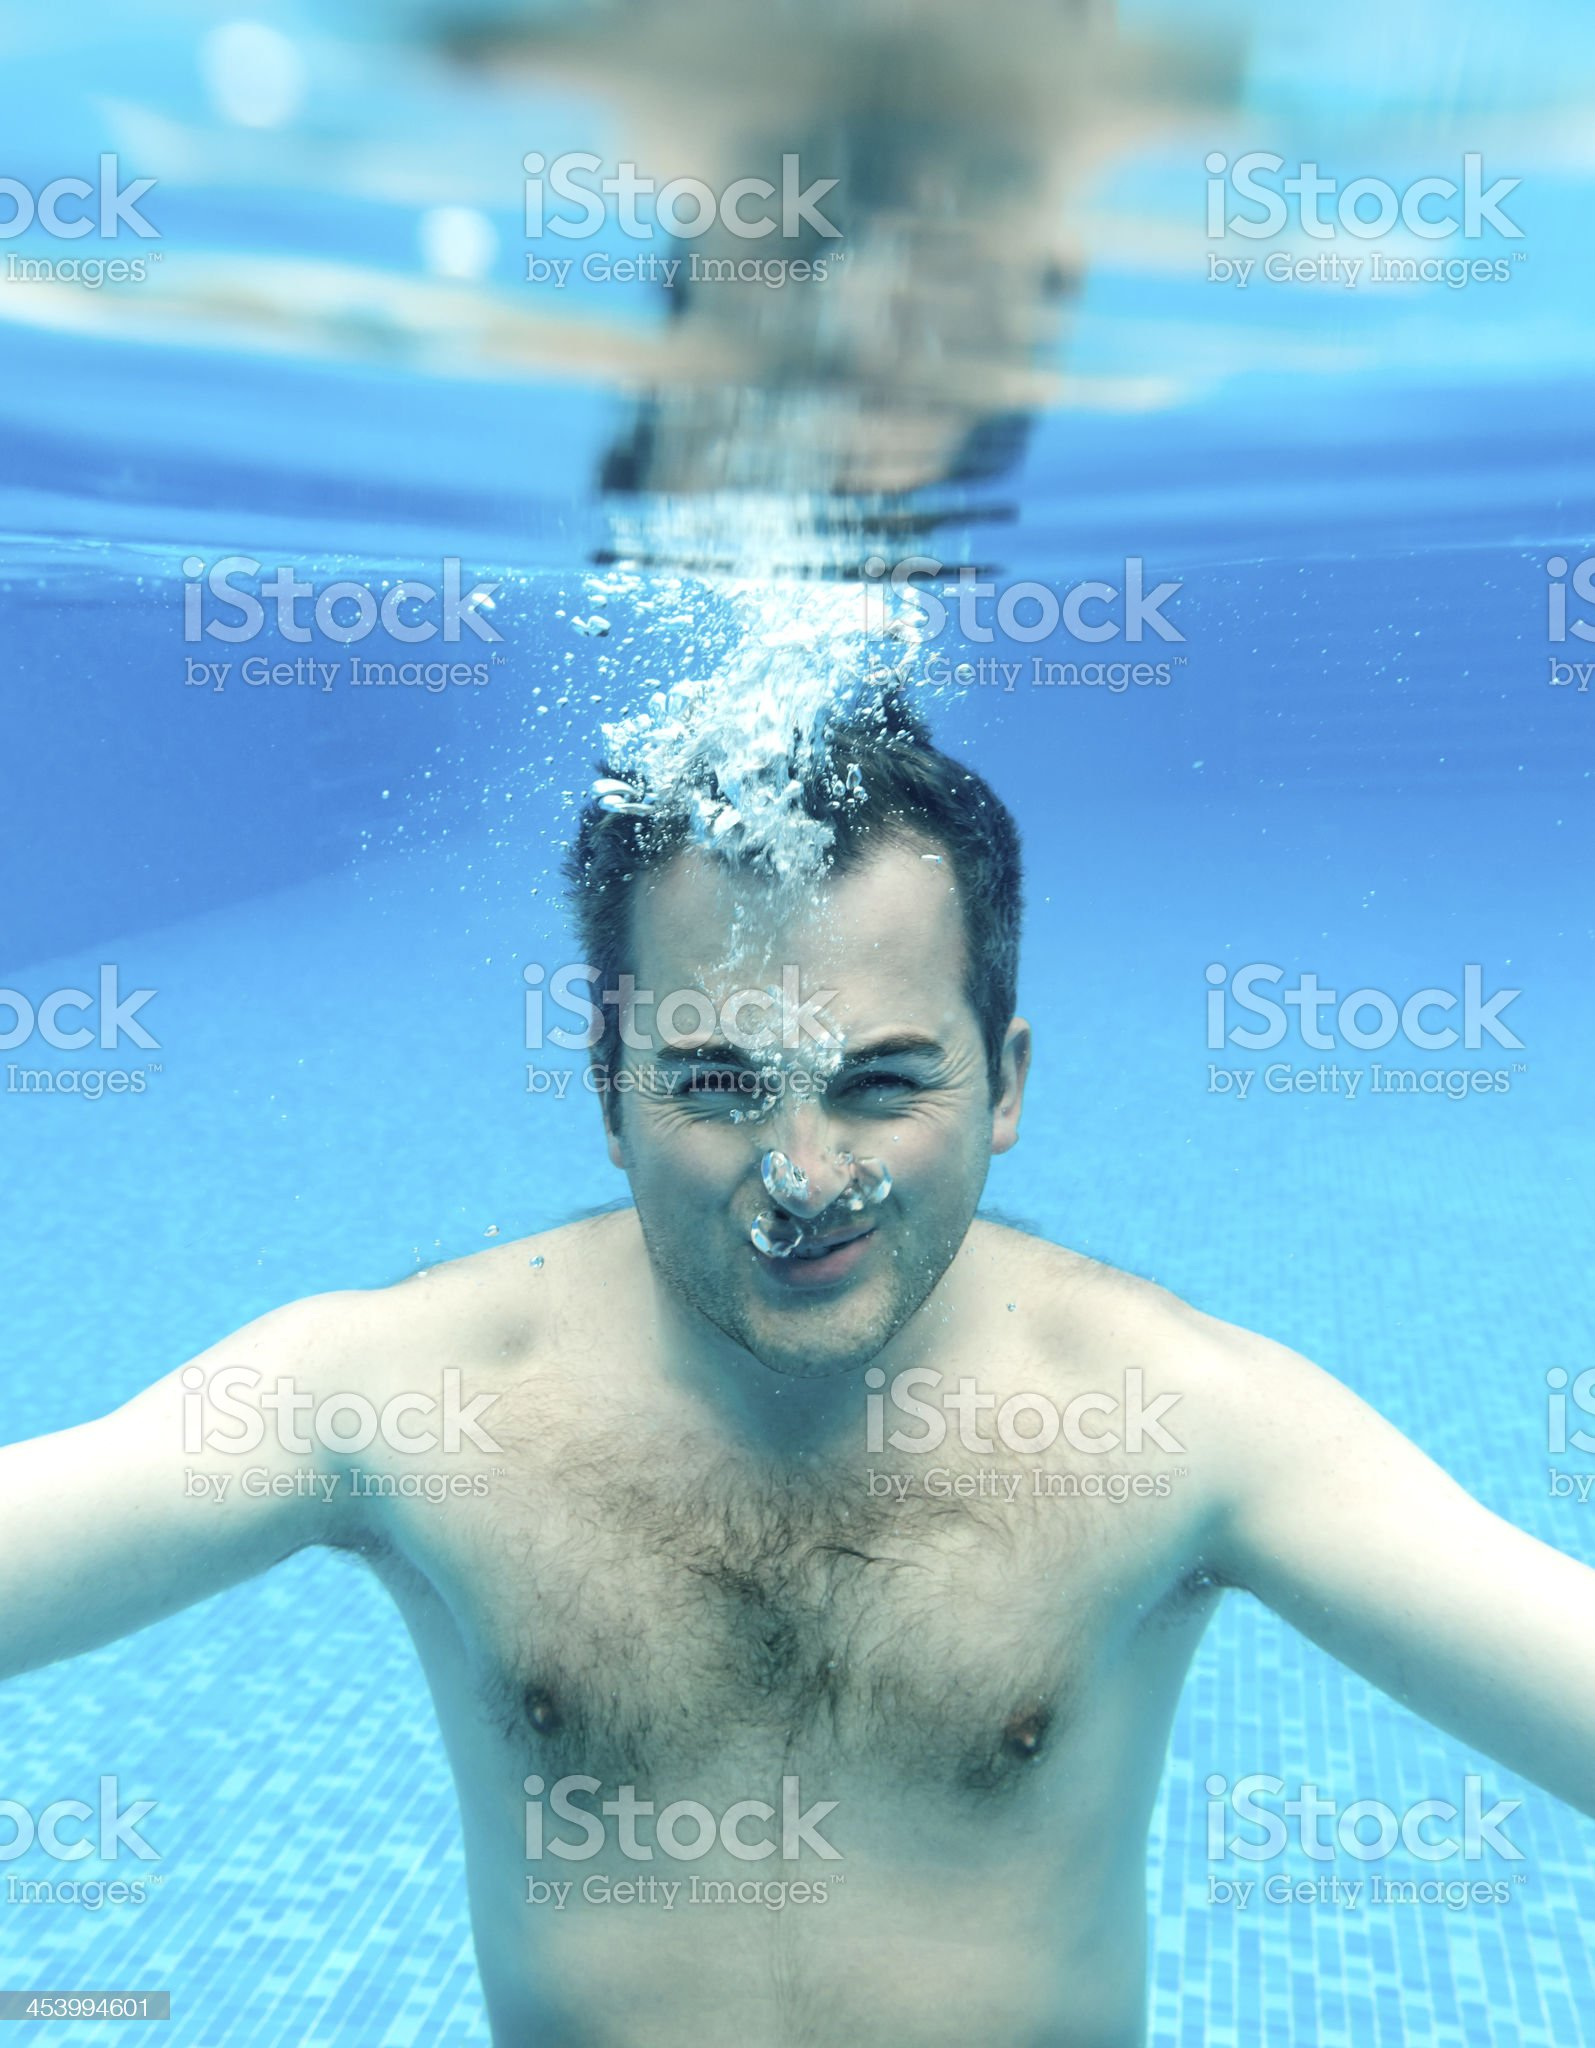 underwater portrait royalty-free stock photo